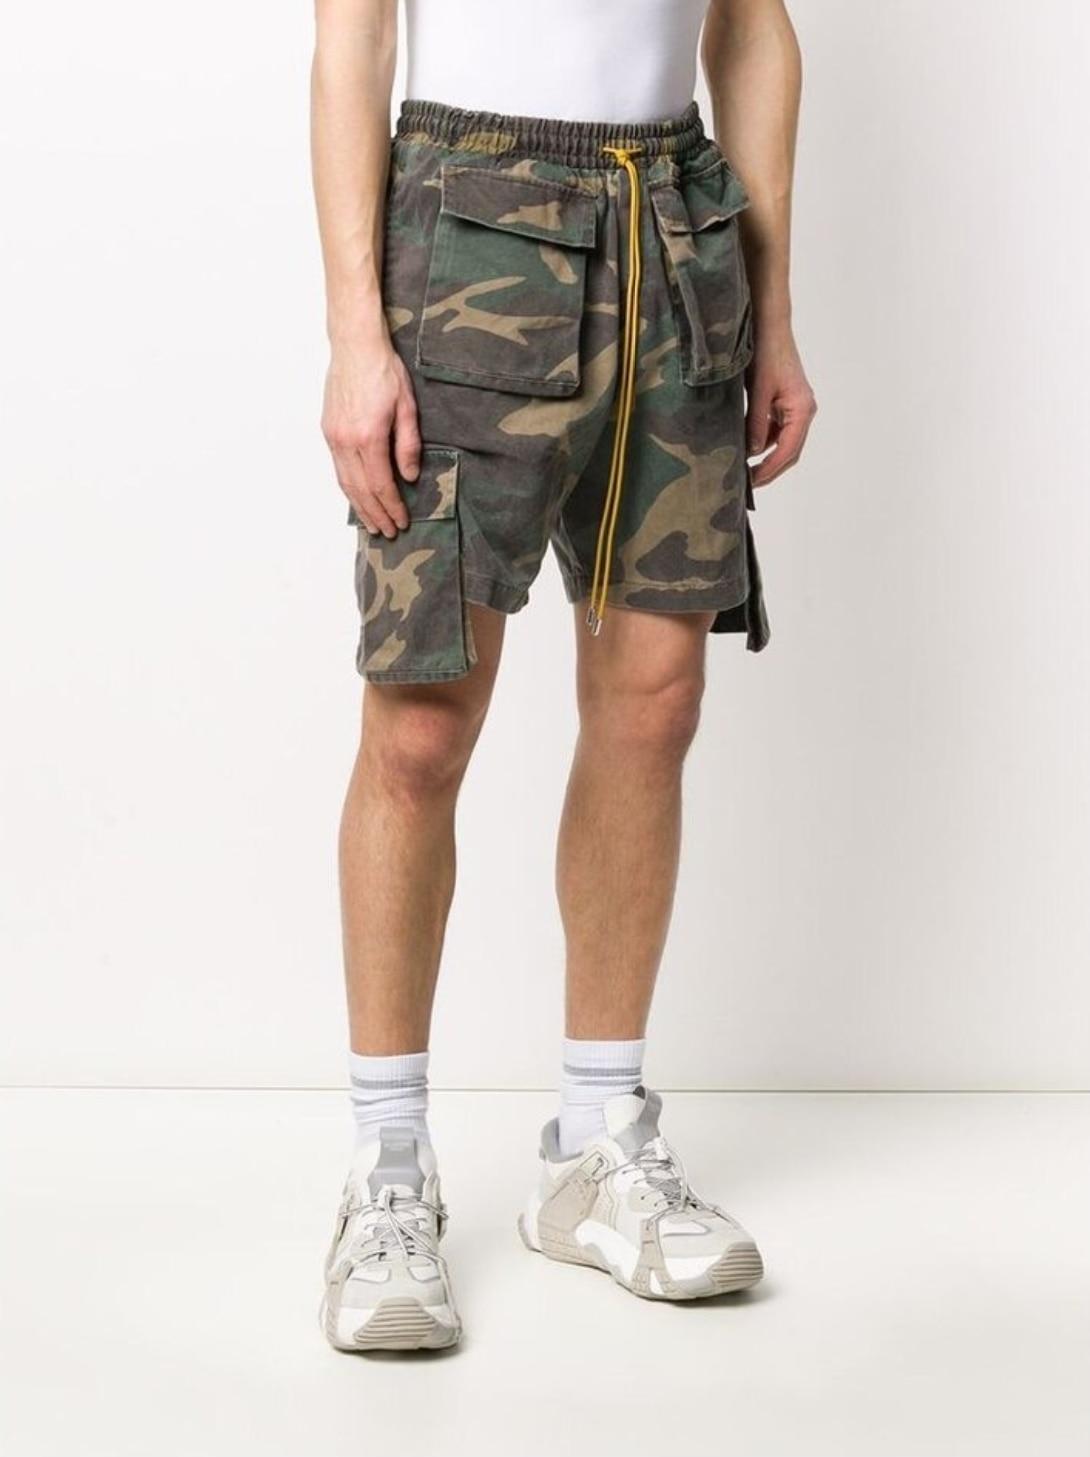 Camouflage RHUDE Shorts 2020ss Men Women 1:1 Top Version Multi Pockets Beach Drawstring Sportswear RHUDE Shorts недорого